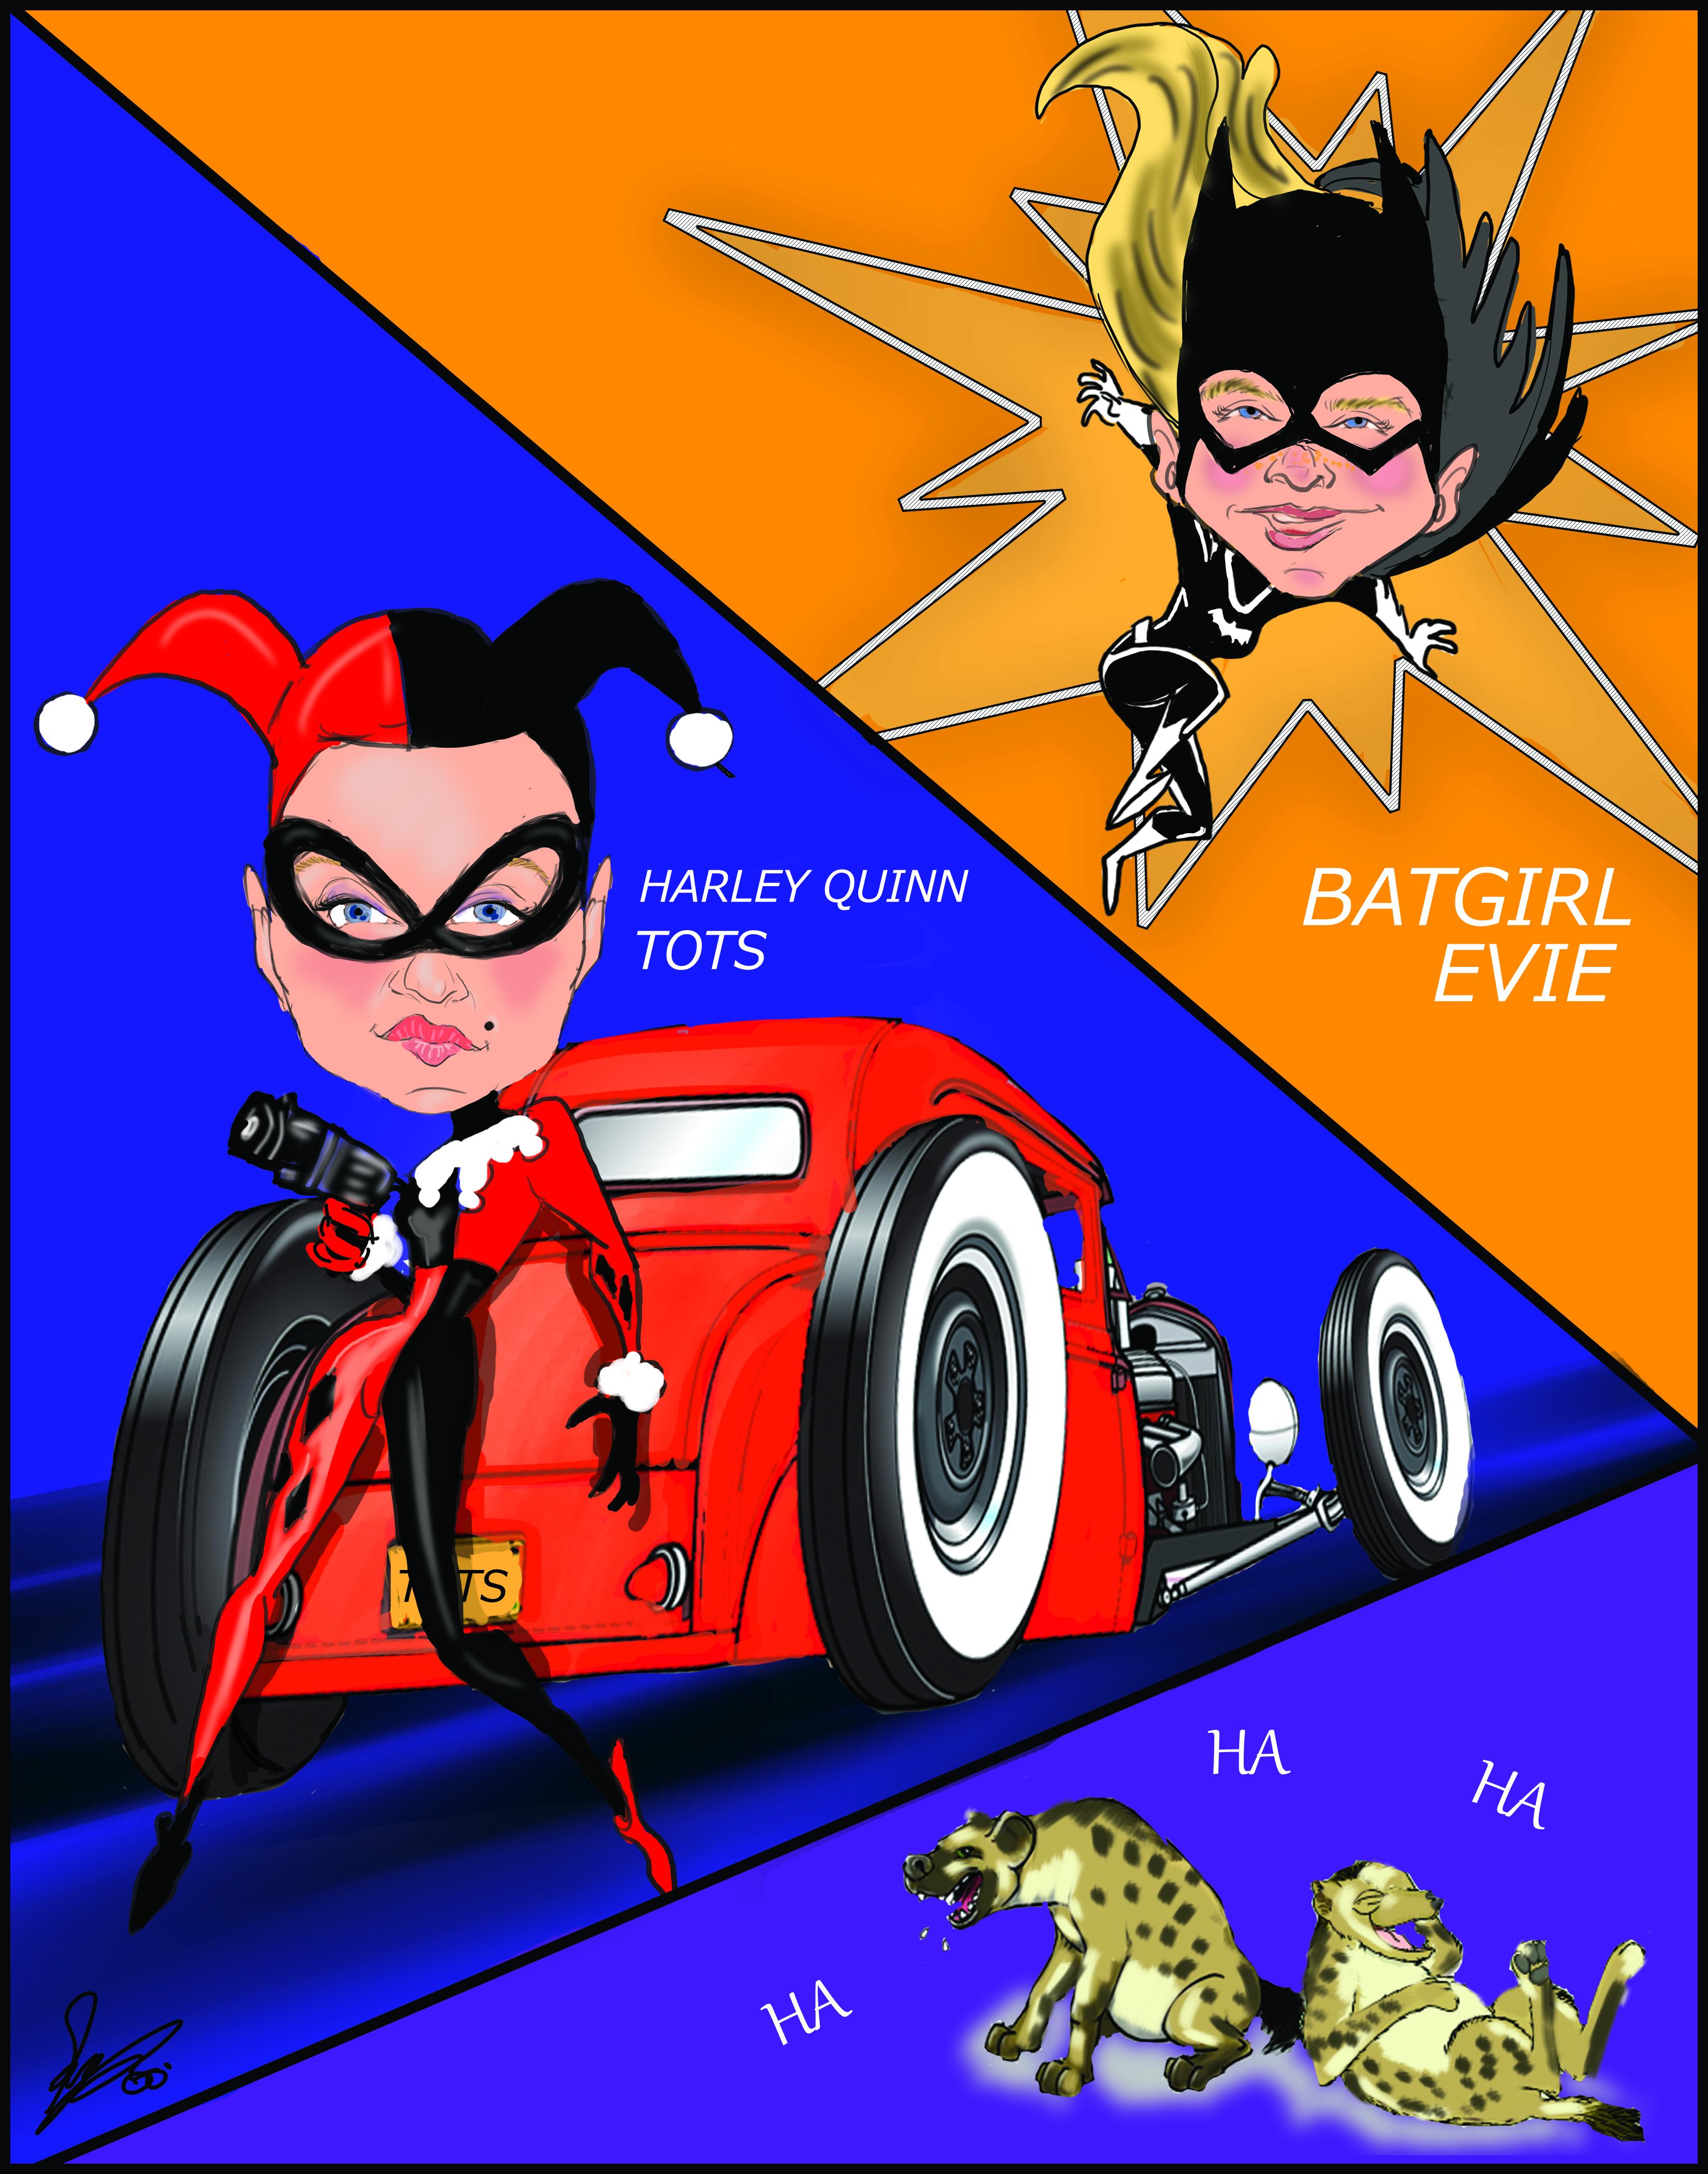 final_caricature_superhero_comic_style2